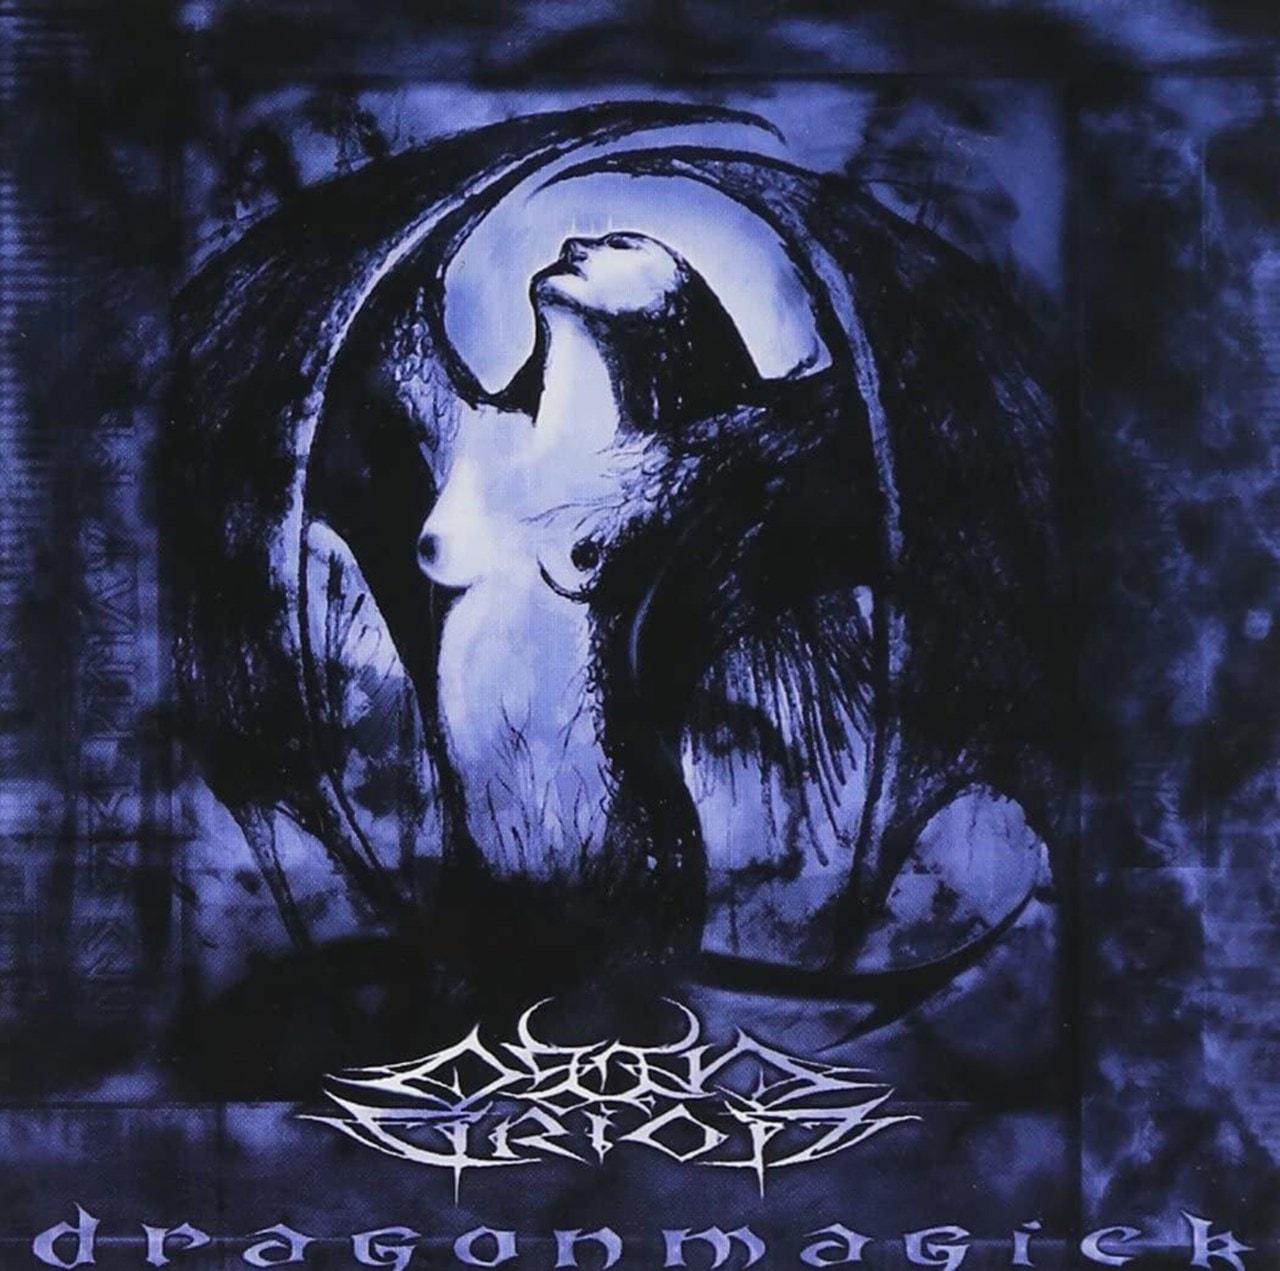 Dragonmagick - 1